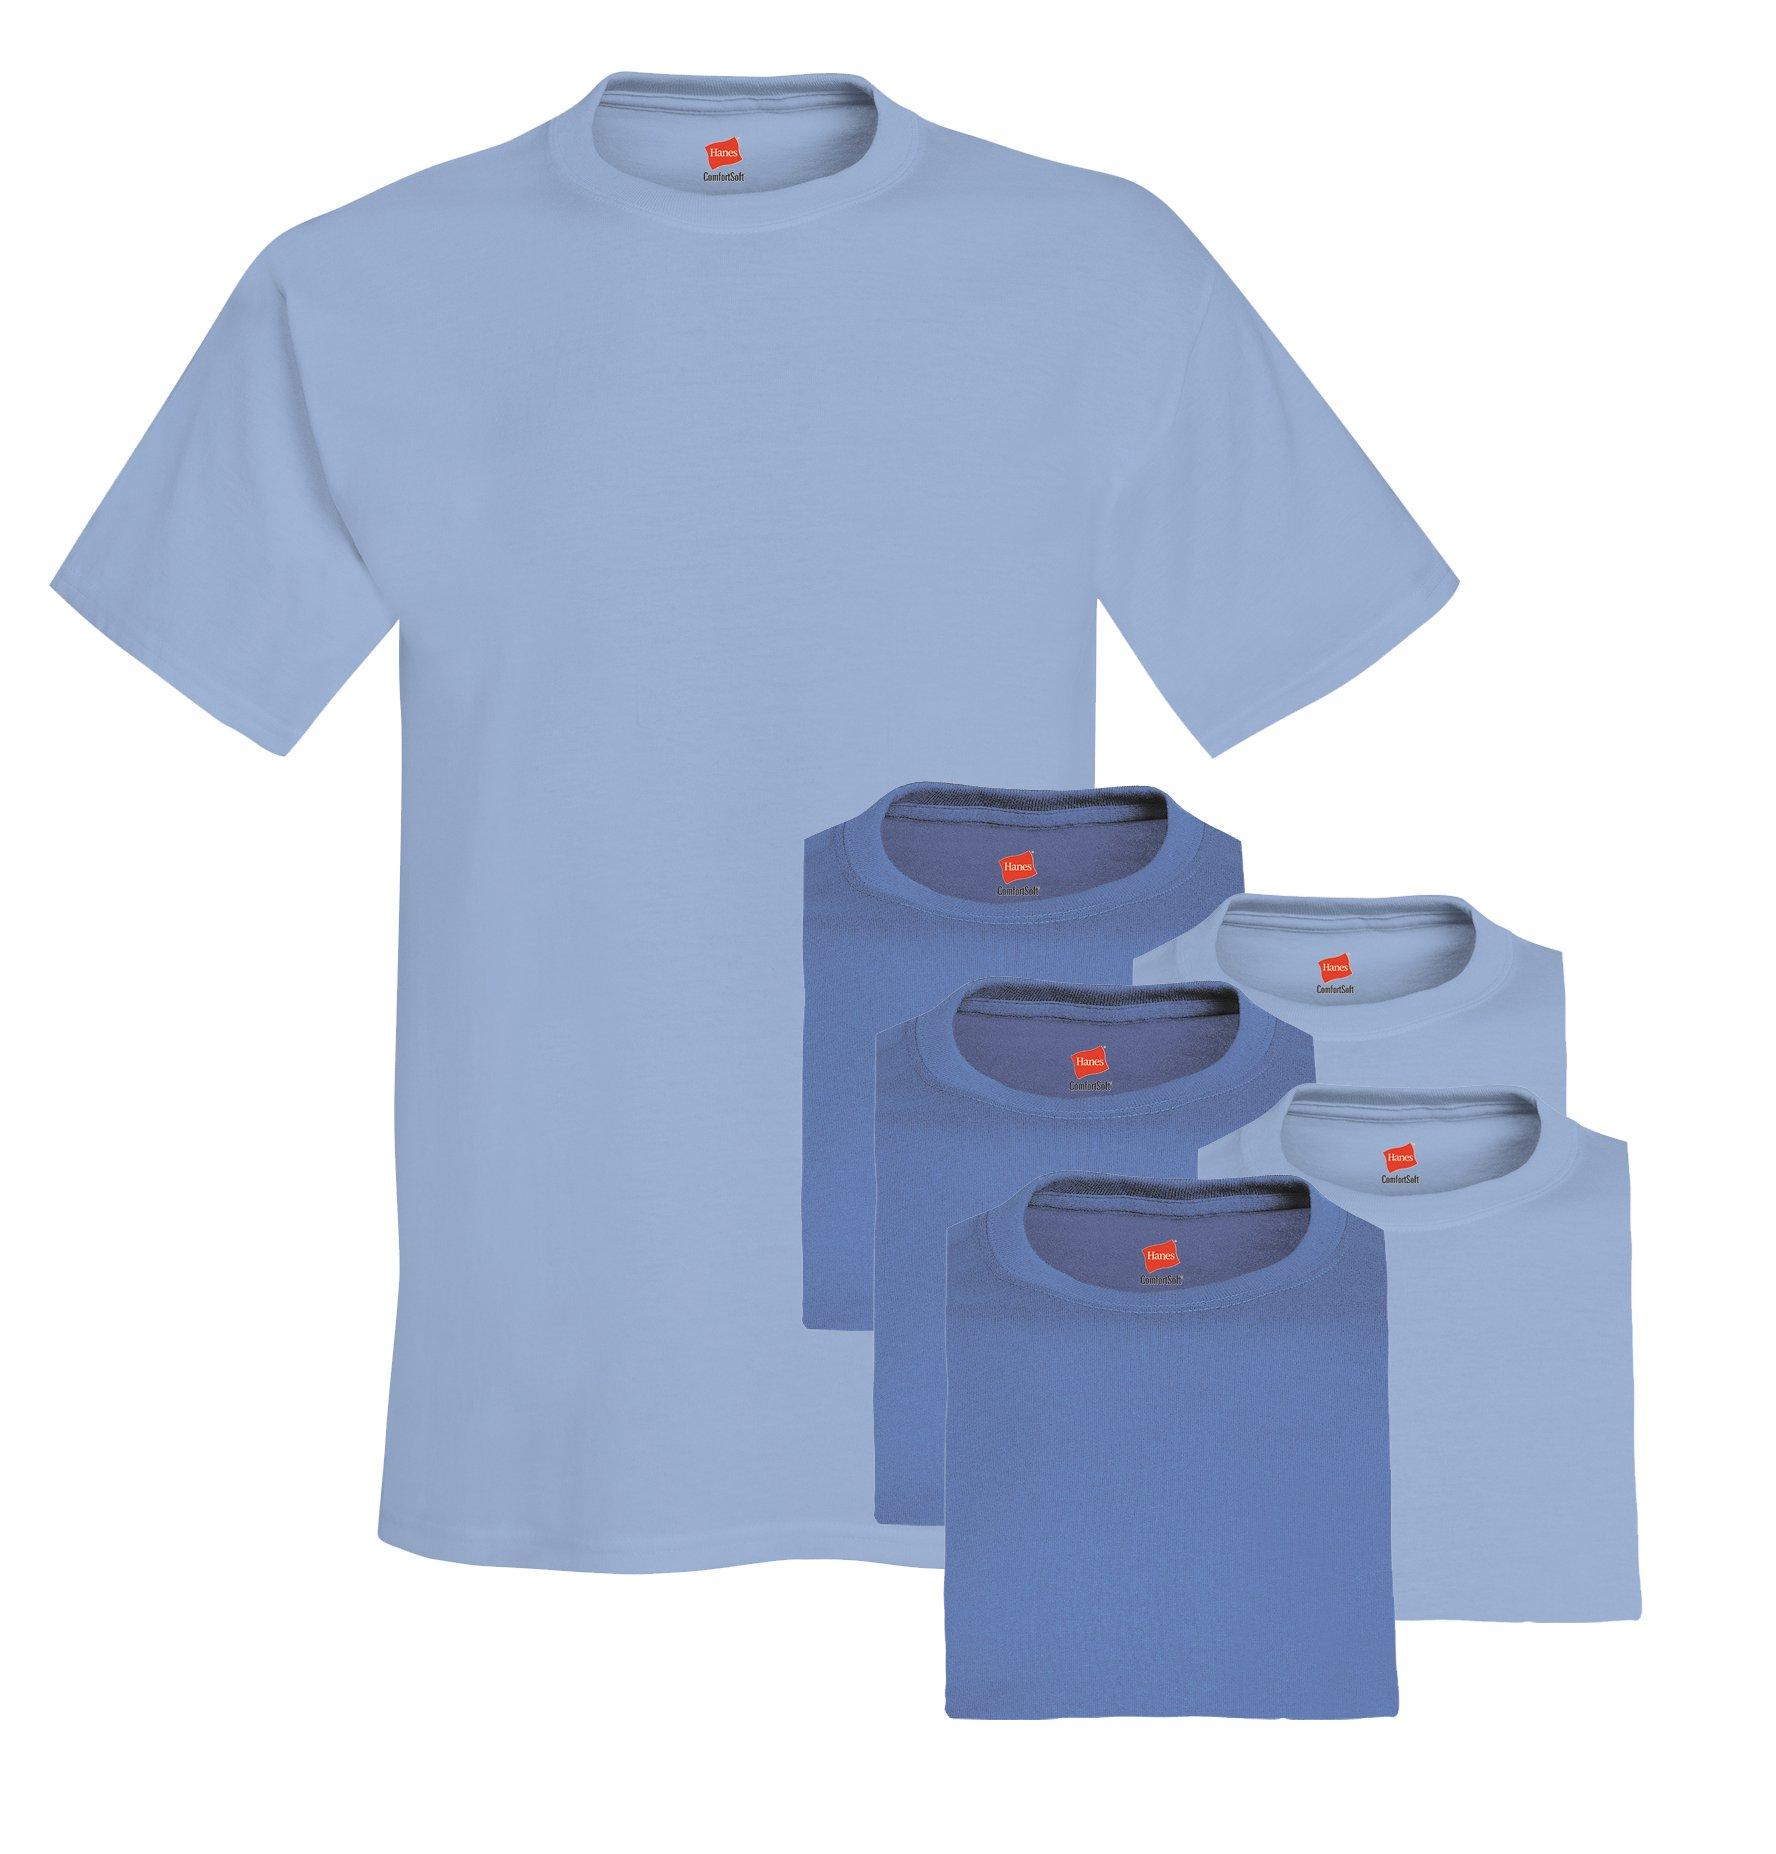 Hanes mens 5.2 oz. ComfortSoft Cotton T-Shirt(5280)-DENIM BLUE/LIGHT BLUE-M-3PK